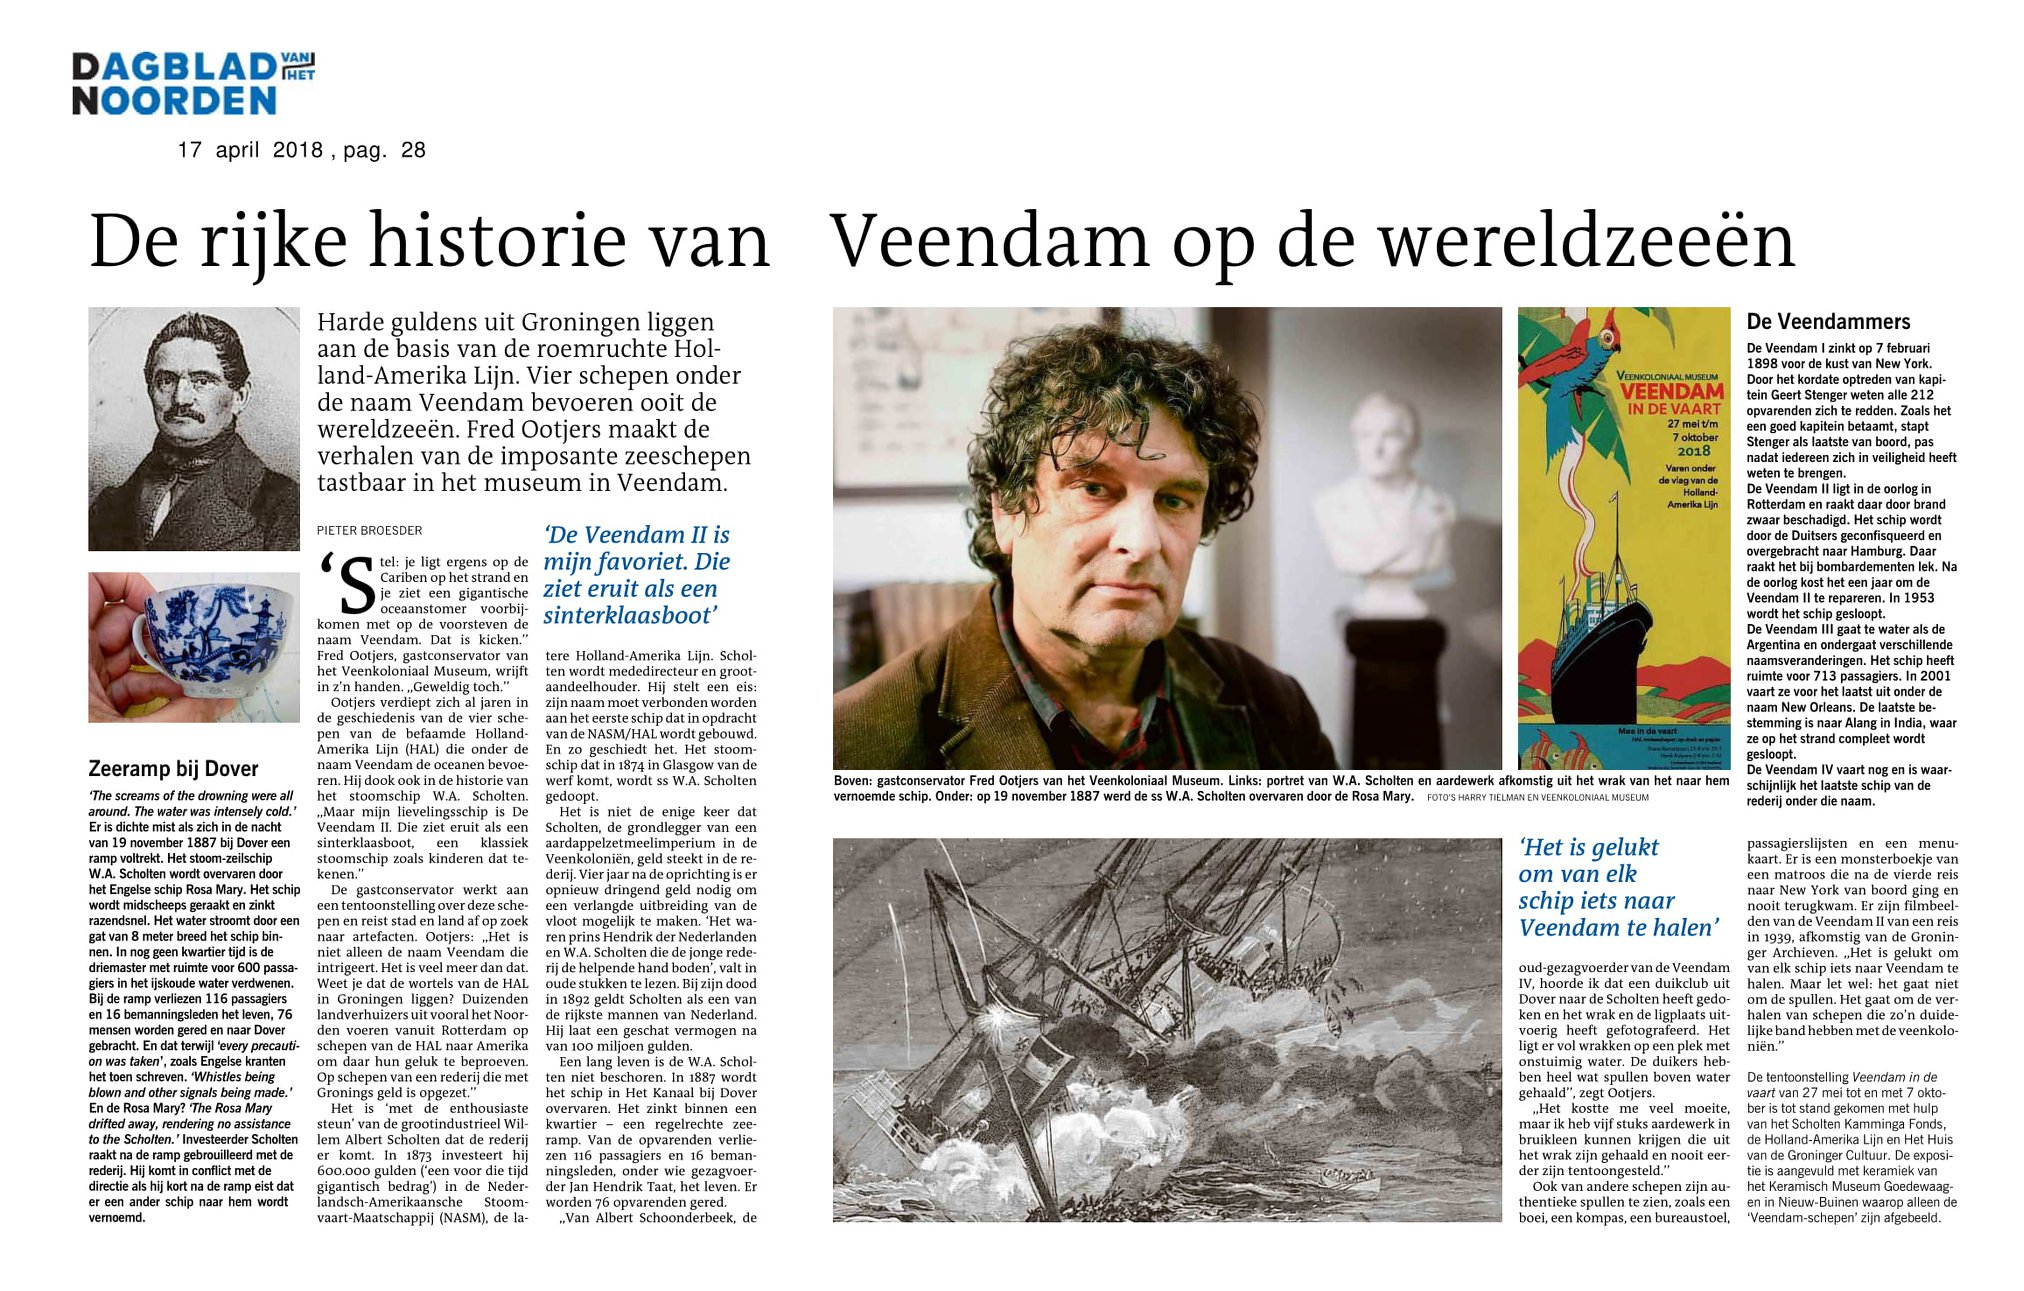 DvhN_17apr18_Rijke historie Veendam (HAL)